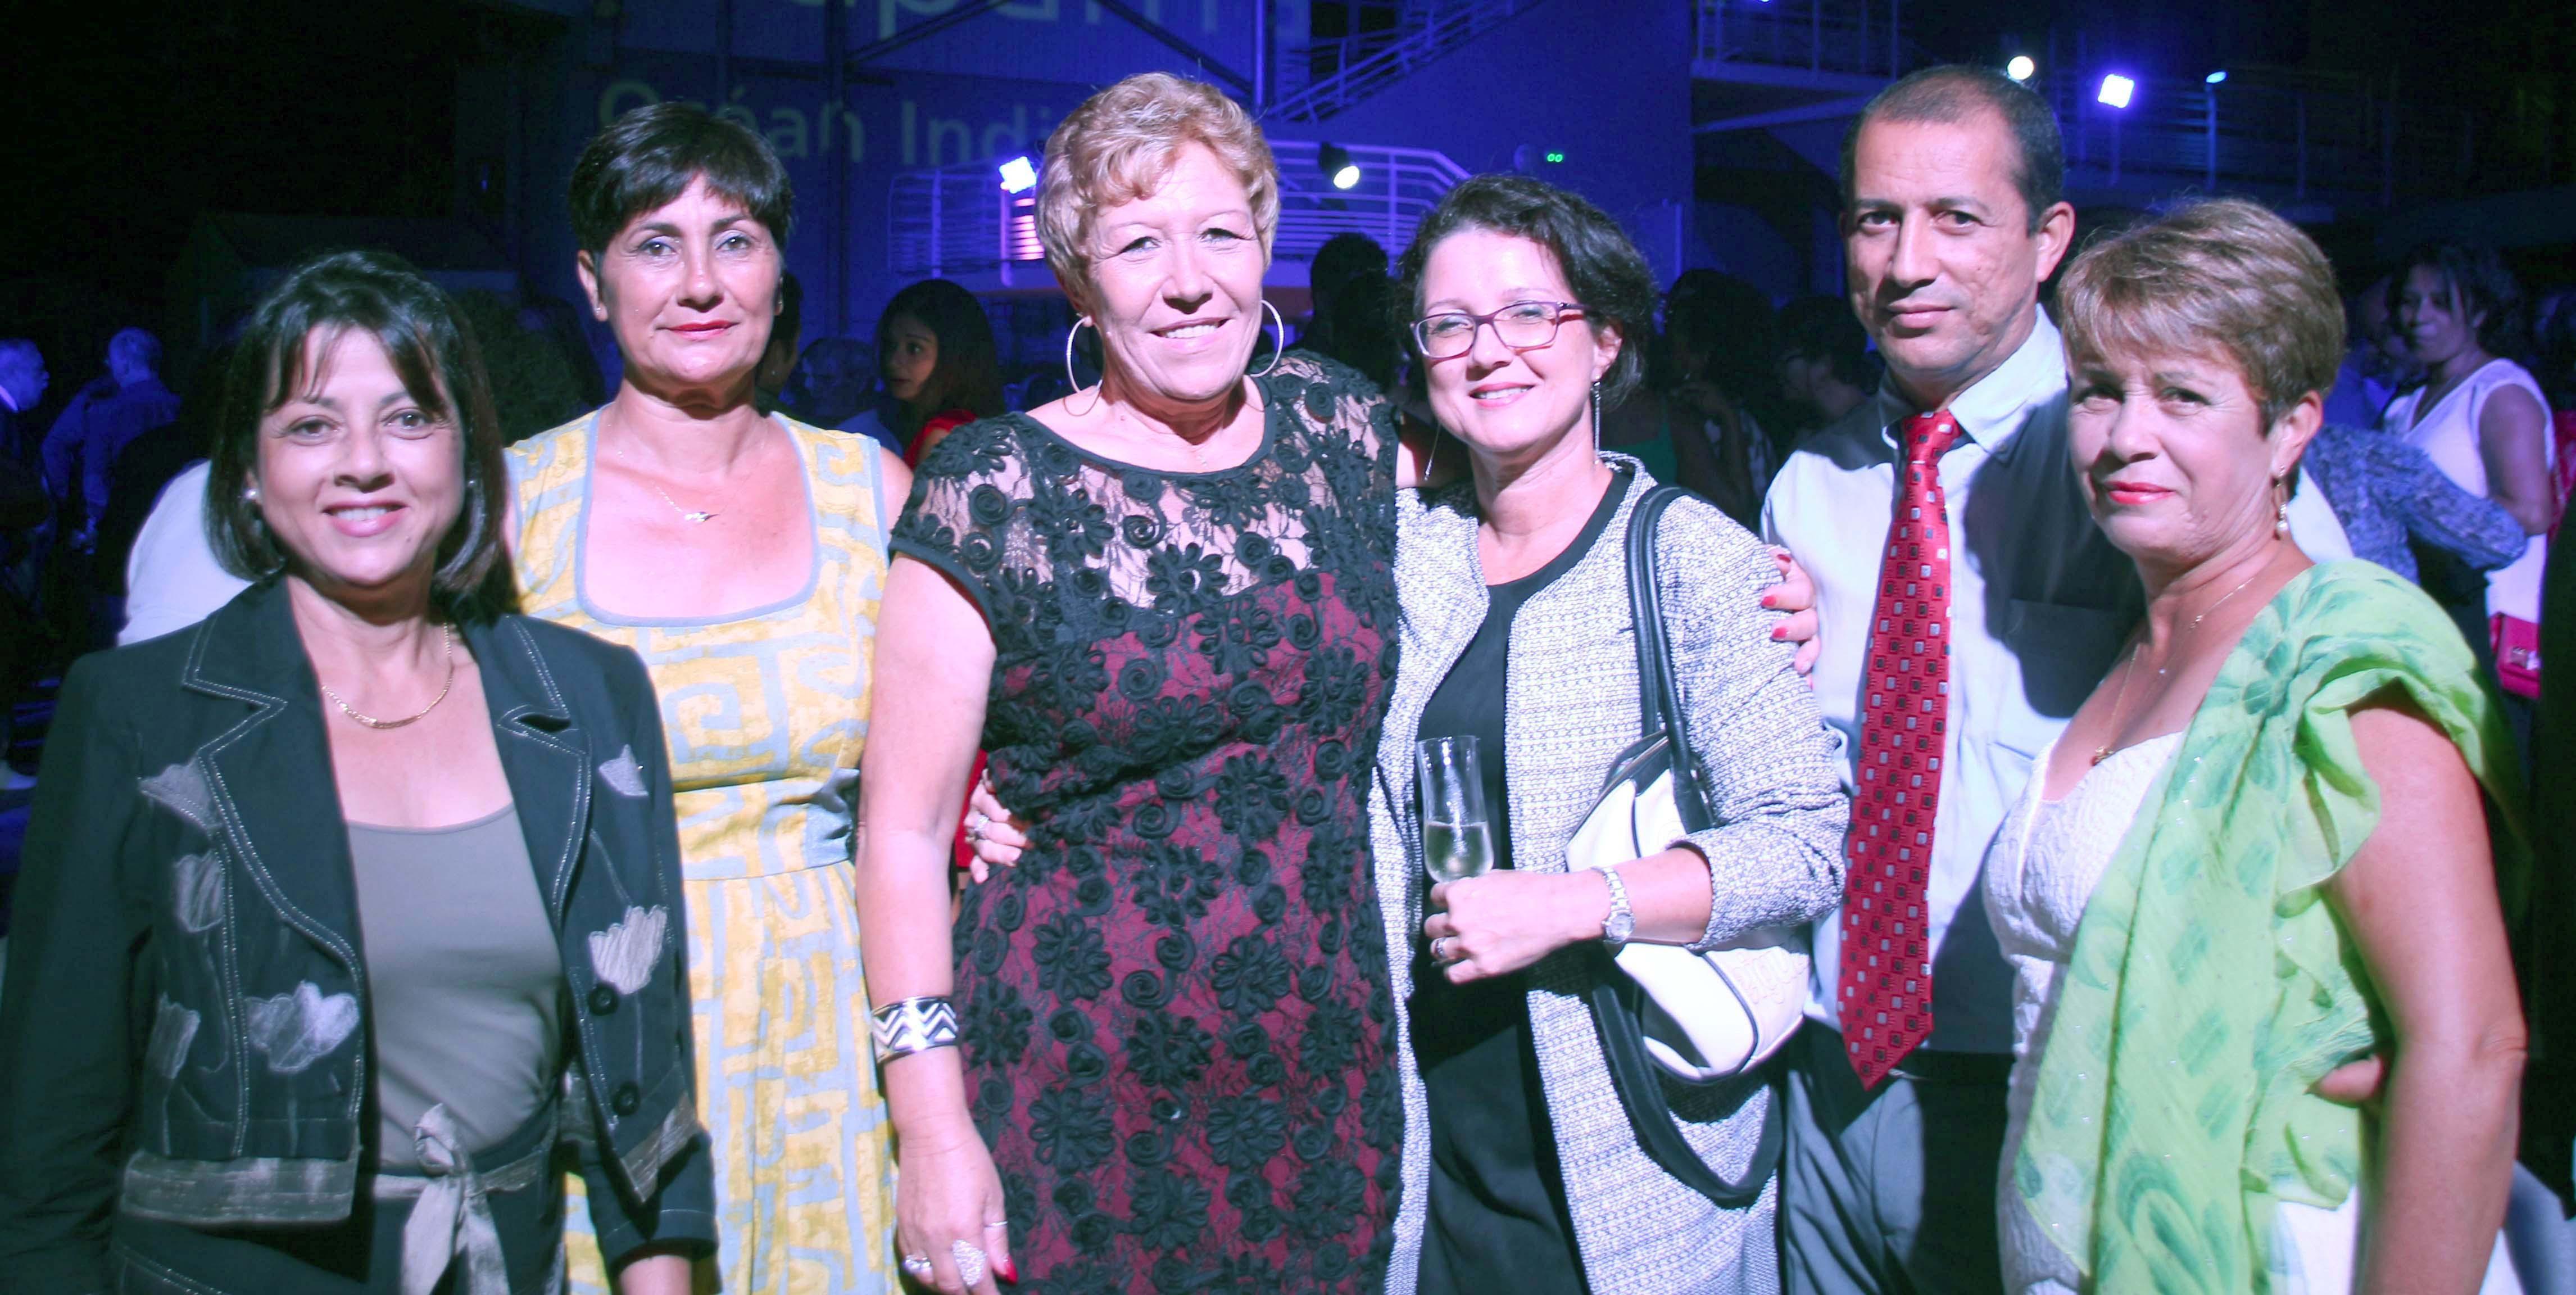 Marie-Jeanne Grondin, vice-présidente Groupama Sainte-Clotilde, Nathalie Sidambarompoulé, Responsable de Groupama Phone, et des invités